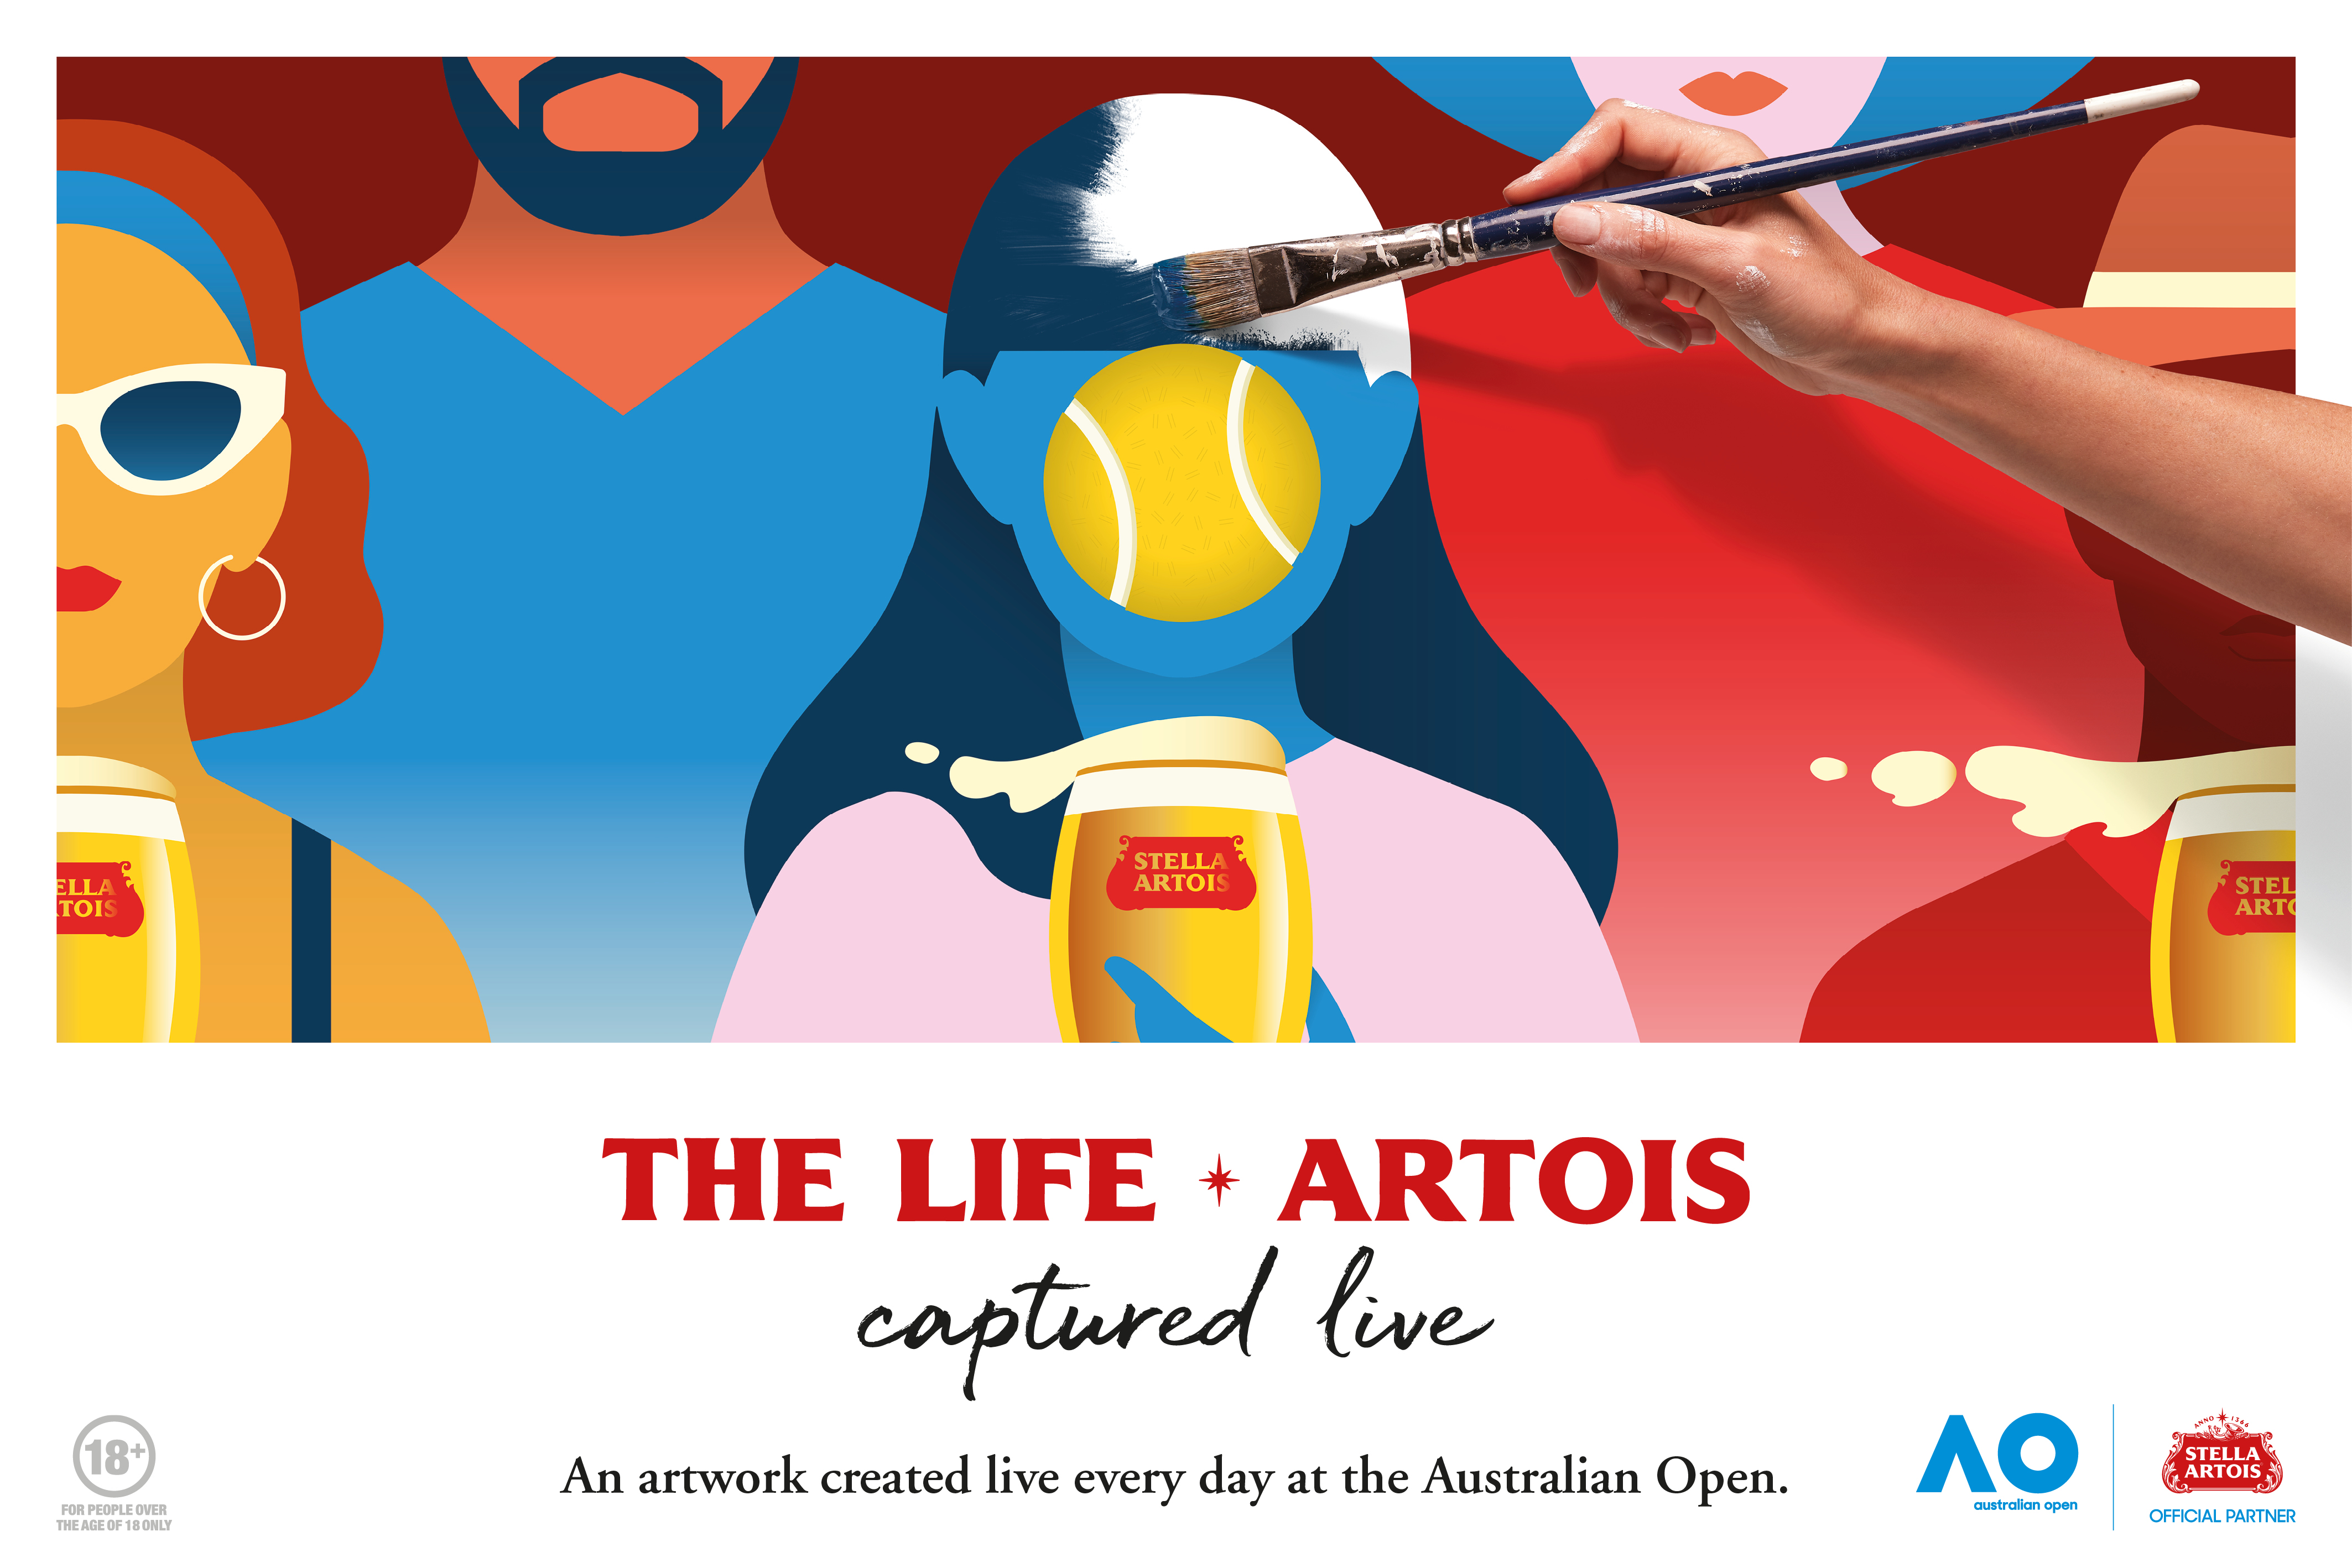 Artists Capture 'The Life Artois' Live at 2020 Australian Open for Stella Artois